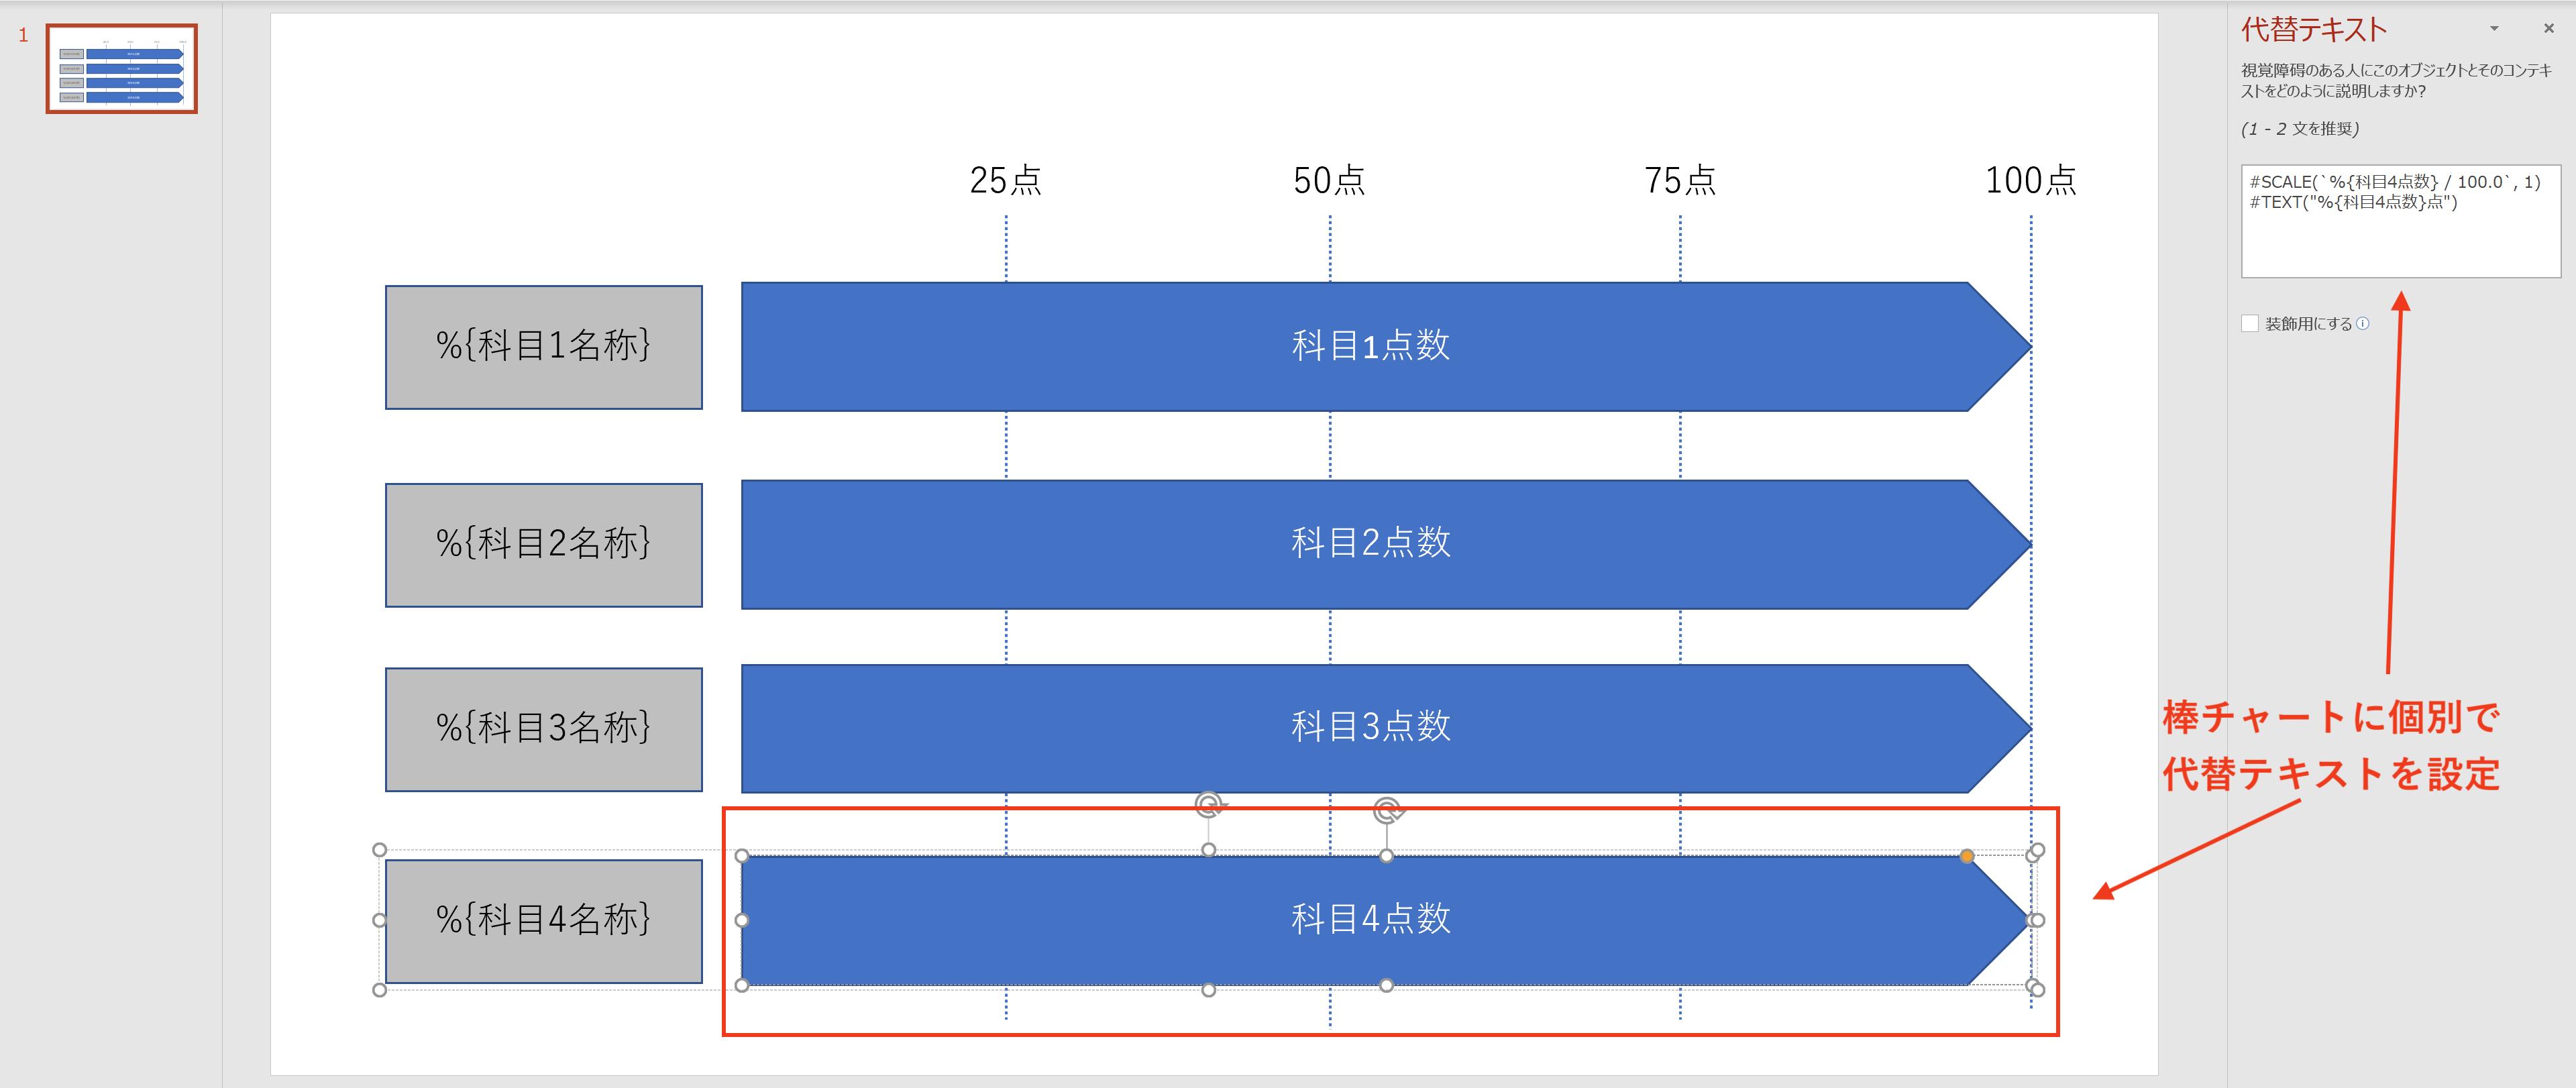 https://s3.ap-northeast-1.amazonaws.com/site.docurain.jp/blog/2021/01/スクリーンショット-2021-01-12-14.58.55.png